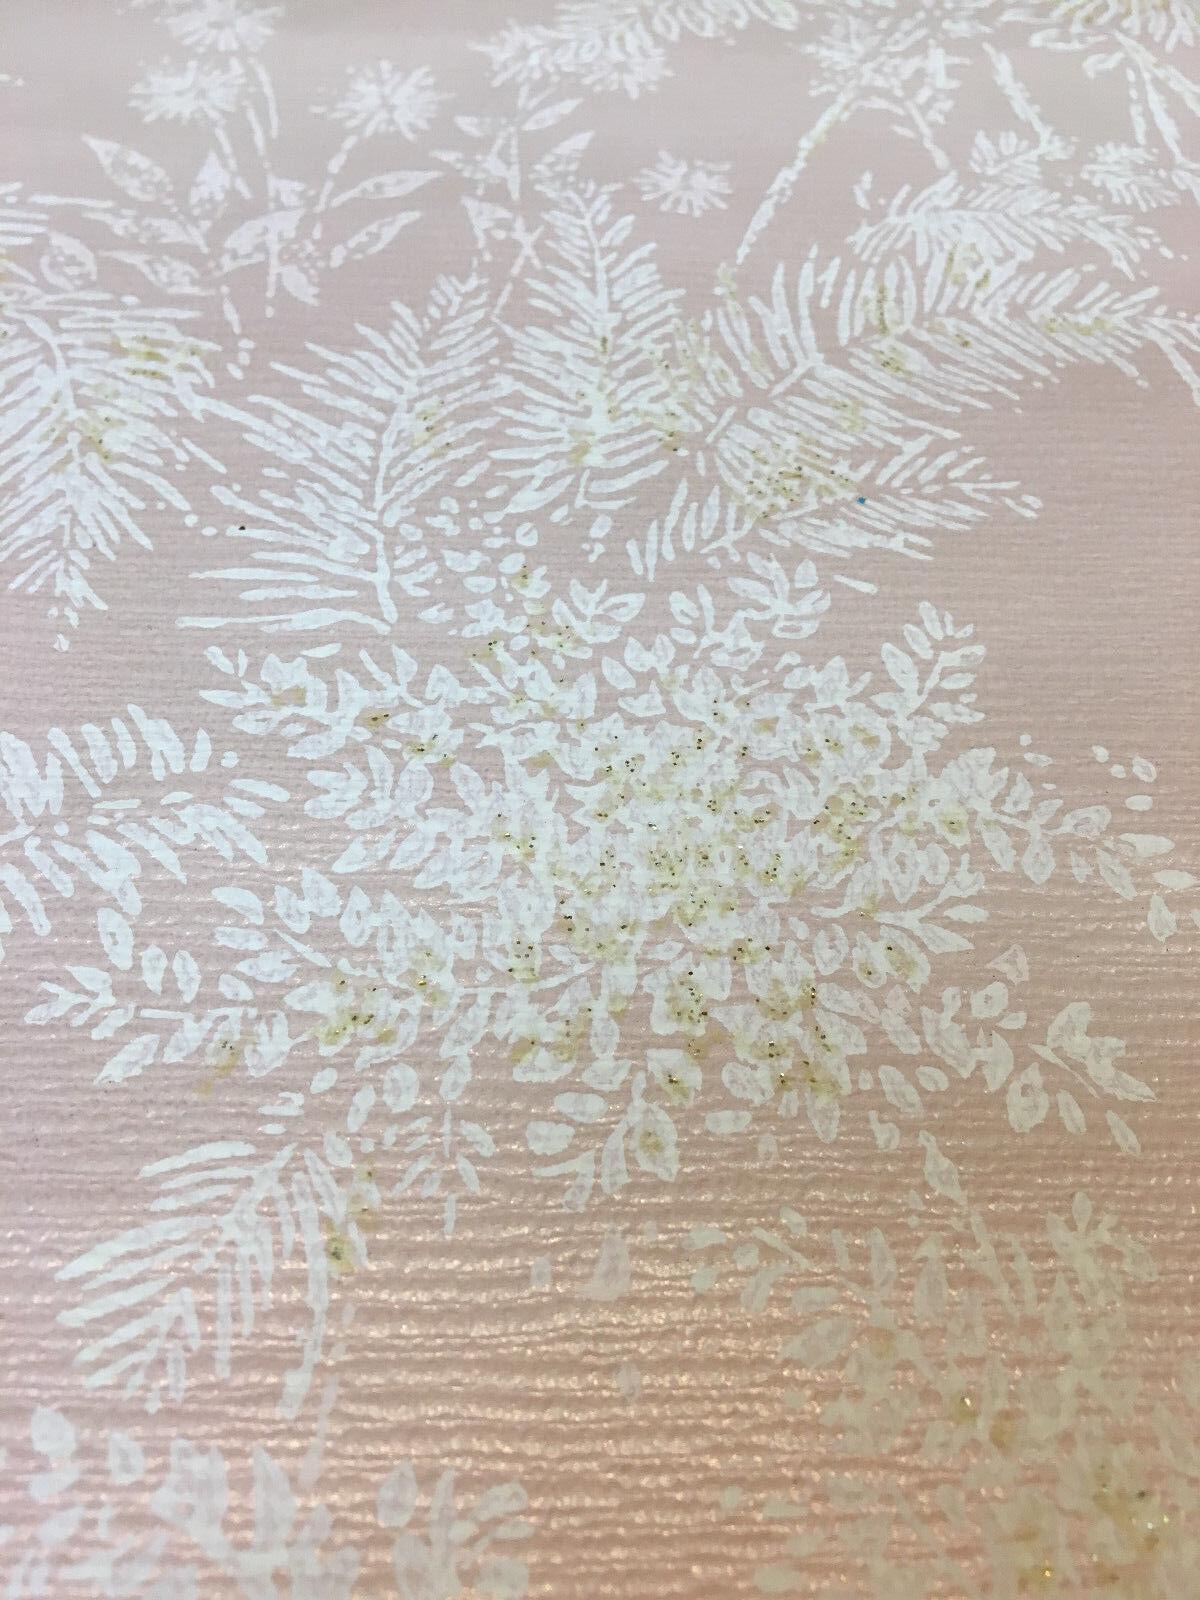 2 partial rolls antique wallpaper 16  19  pink satin paper floral 1930s 1940 NOS